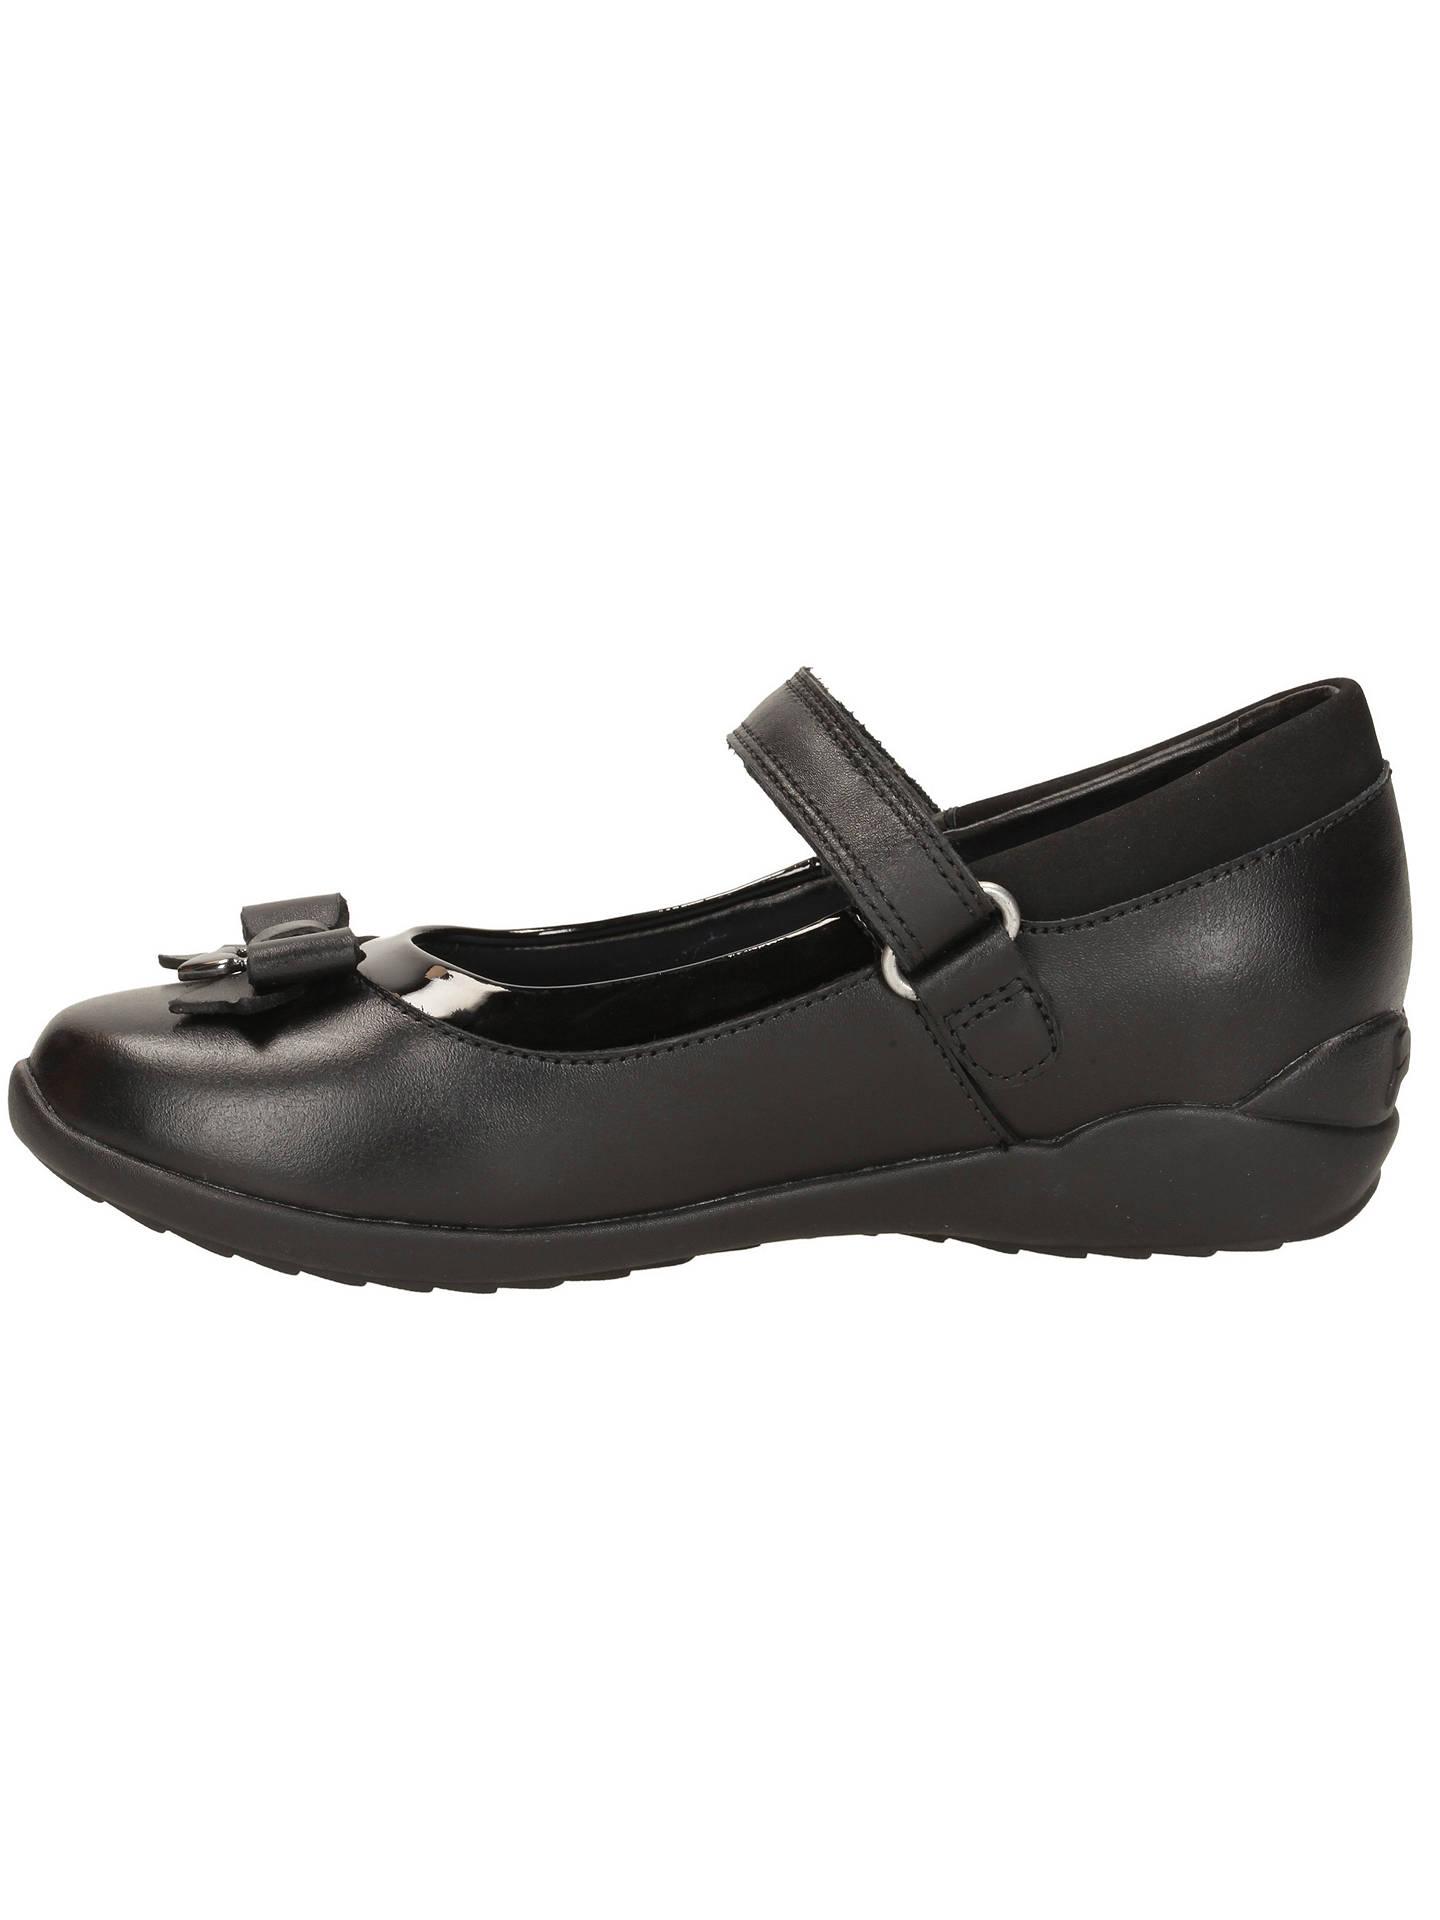 7955a0cf8d5 ... Buy Clarks Children's Gloform Ting Fever School Shoes, Black, 10E Jnr  Online at johnlewis ...